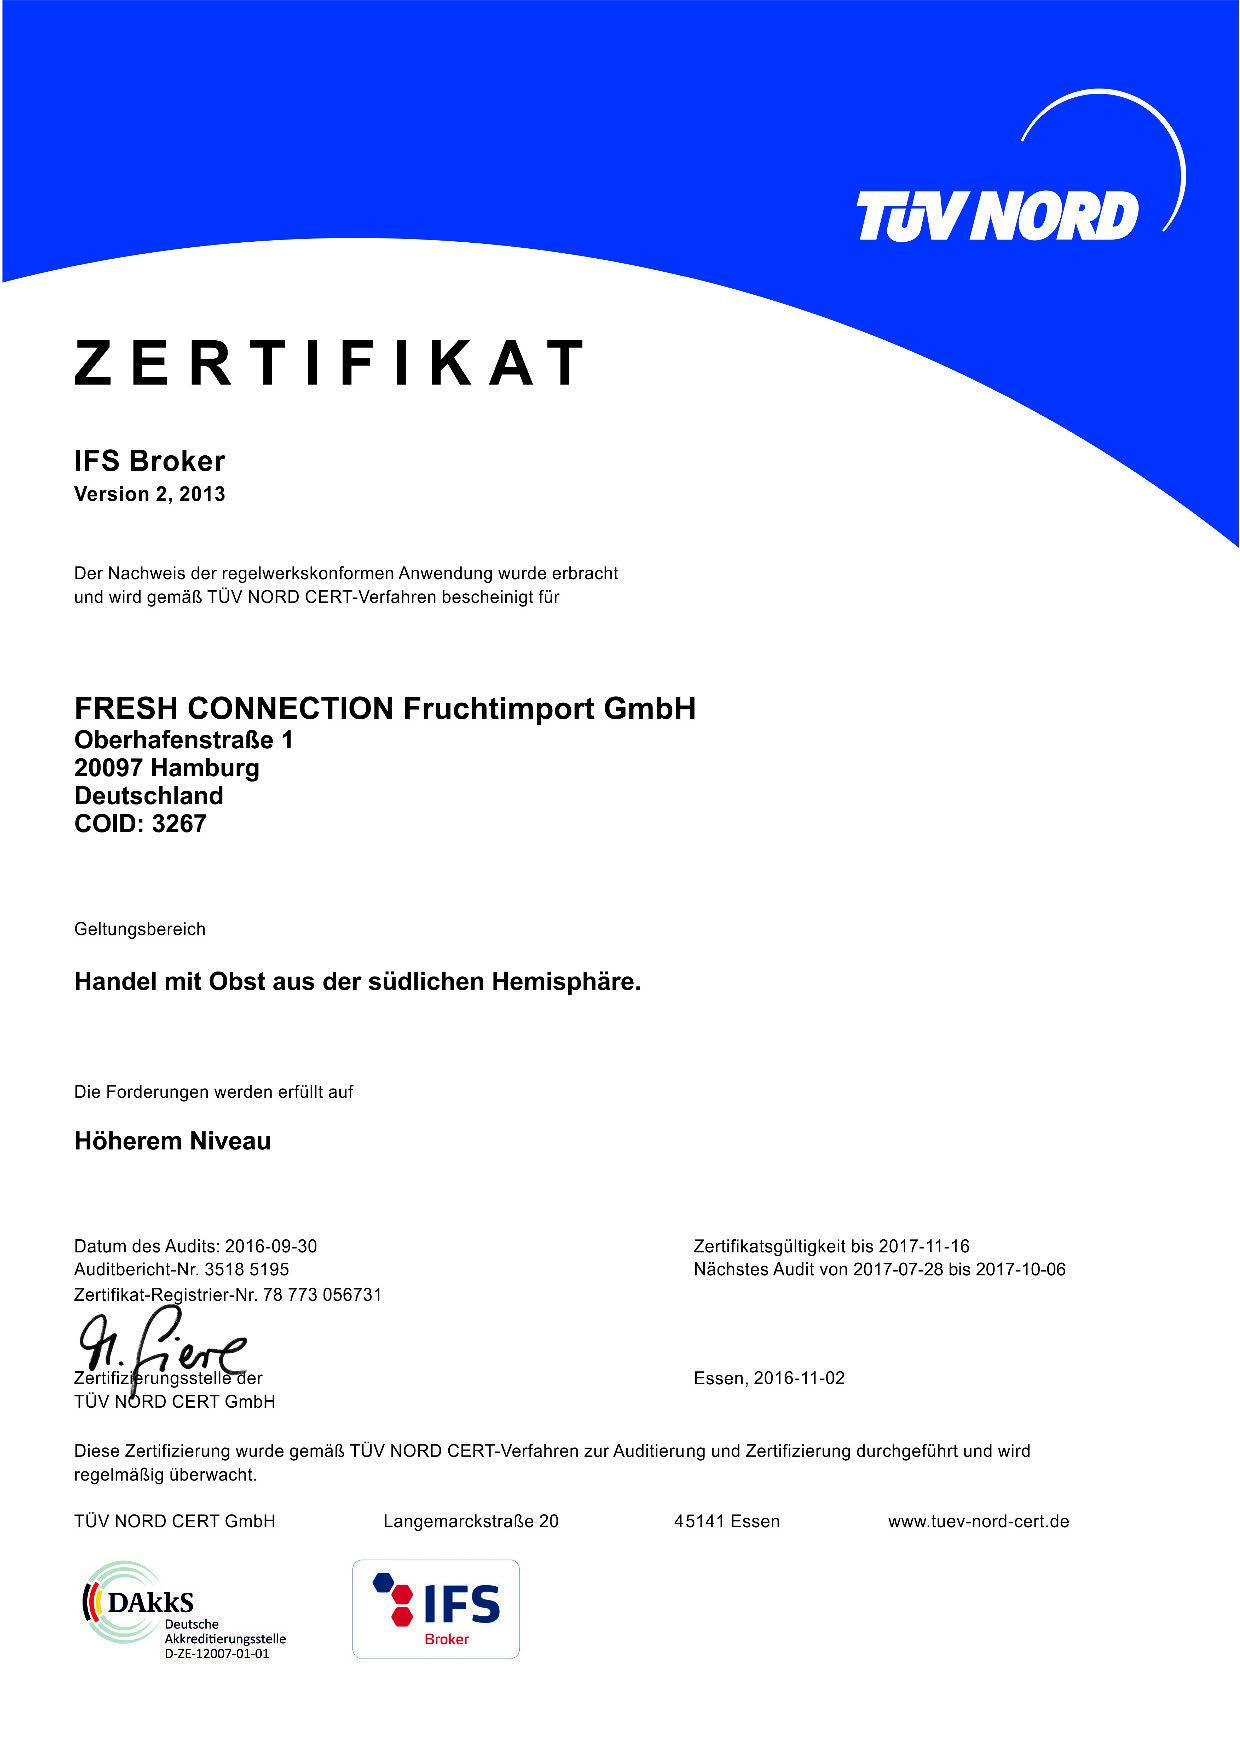 IFS Broker Zertifikat